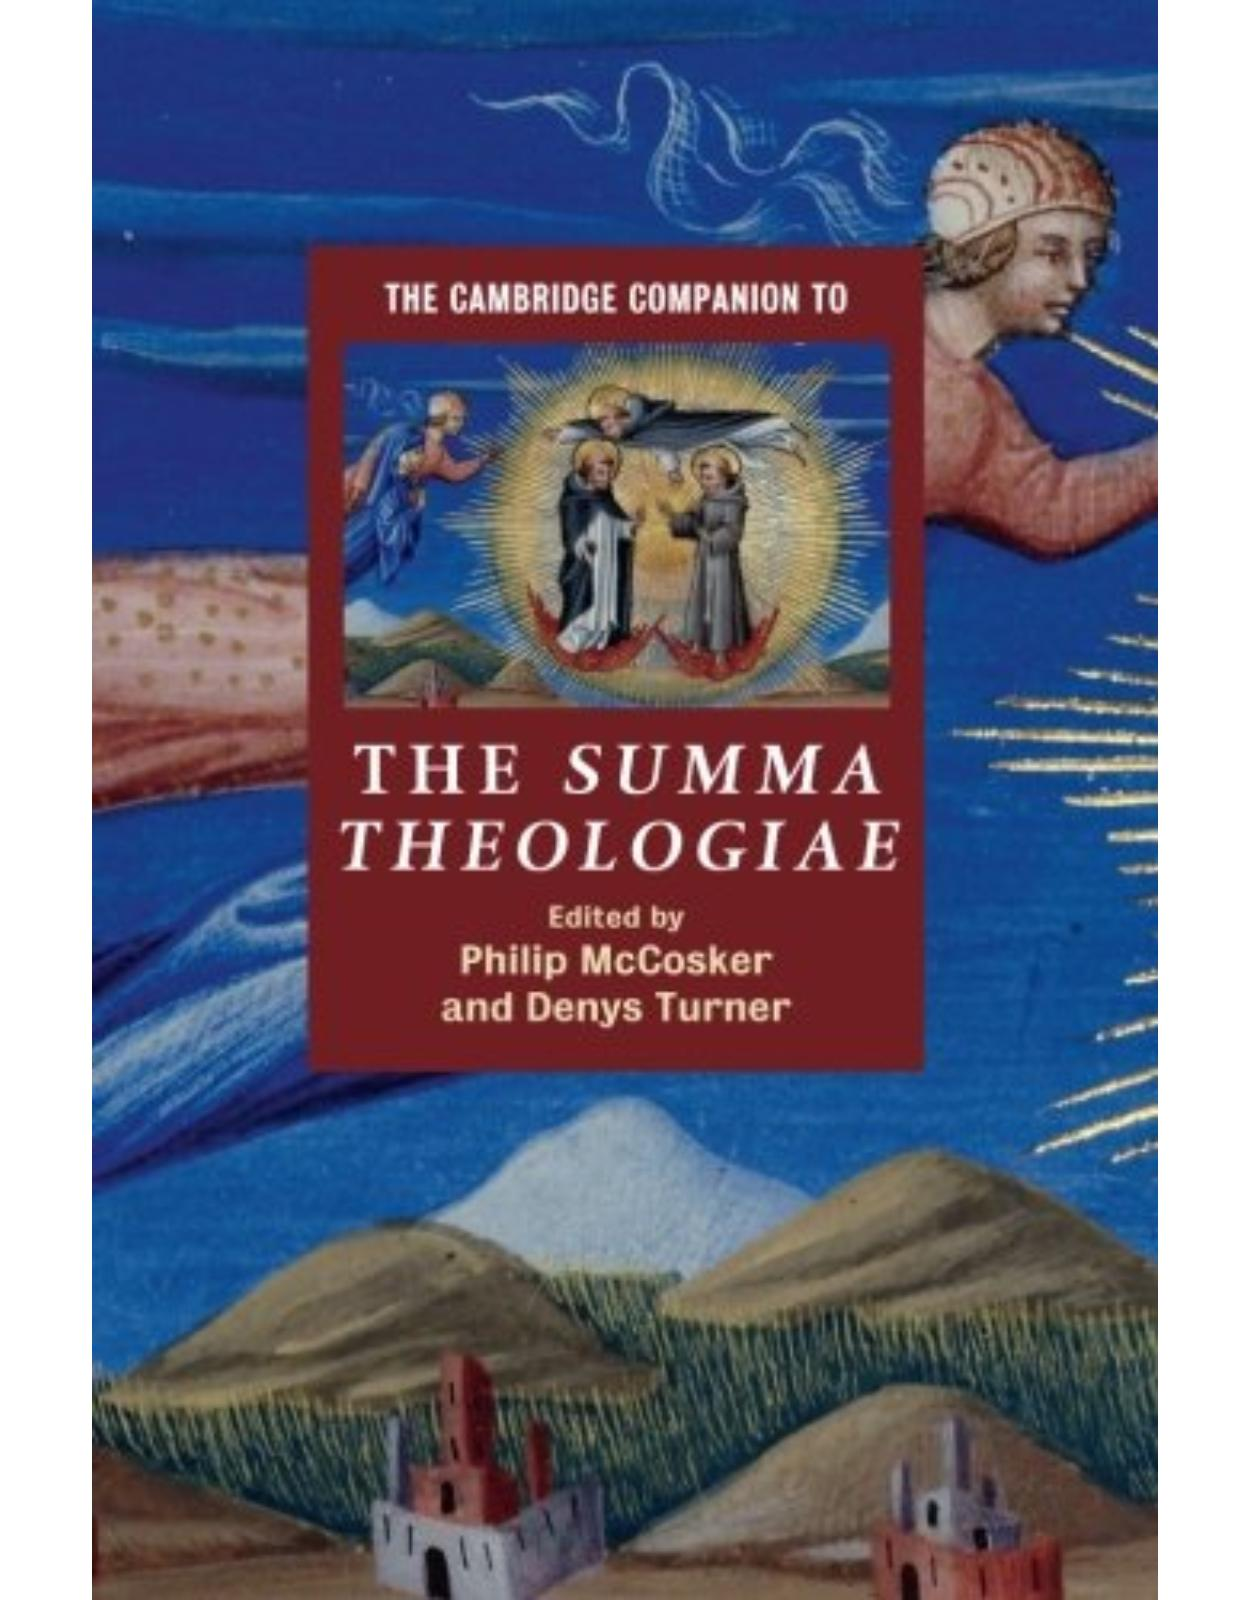 The Cambridge Companion to the Summa Theologiae (Cambridge Companions to Religion)